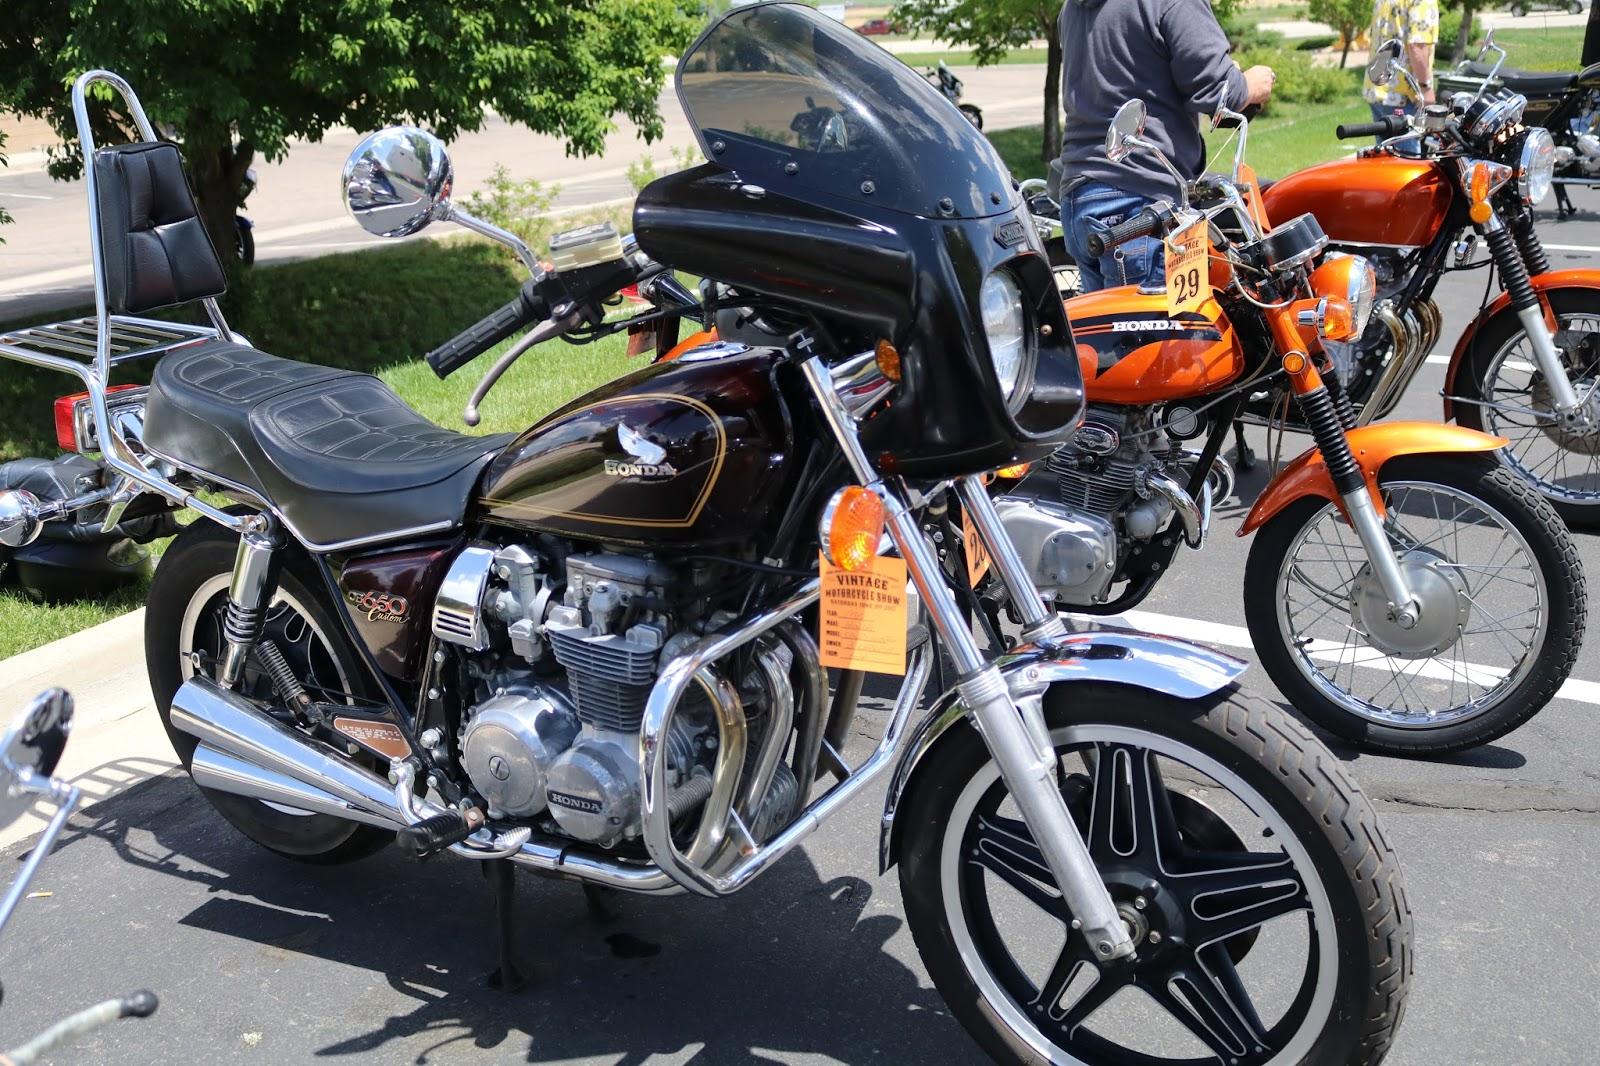 oldmotodude 1980 honda cb650 custom on display at the 2017 vintage motorcycle show frederick. Black Bedroom Furniture Sets. Home Design Ideas